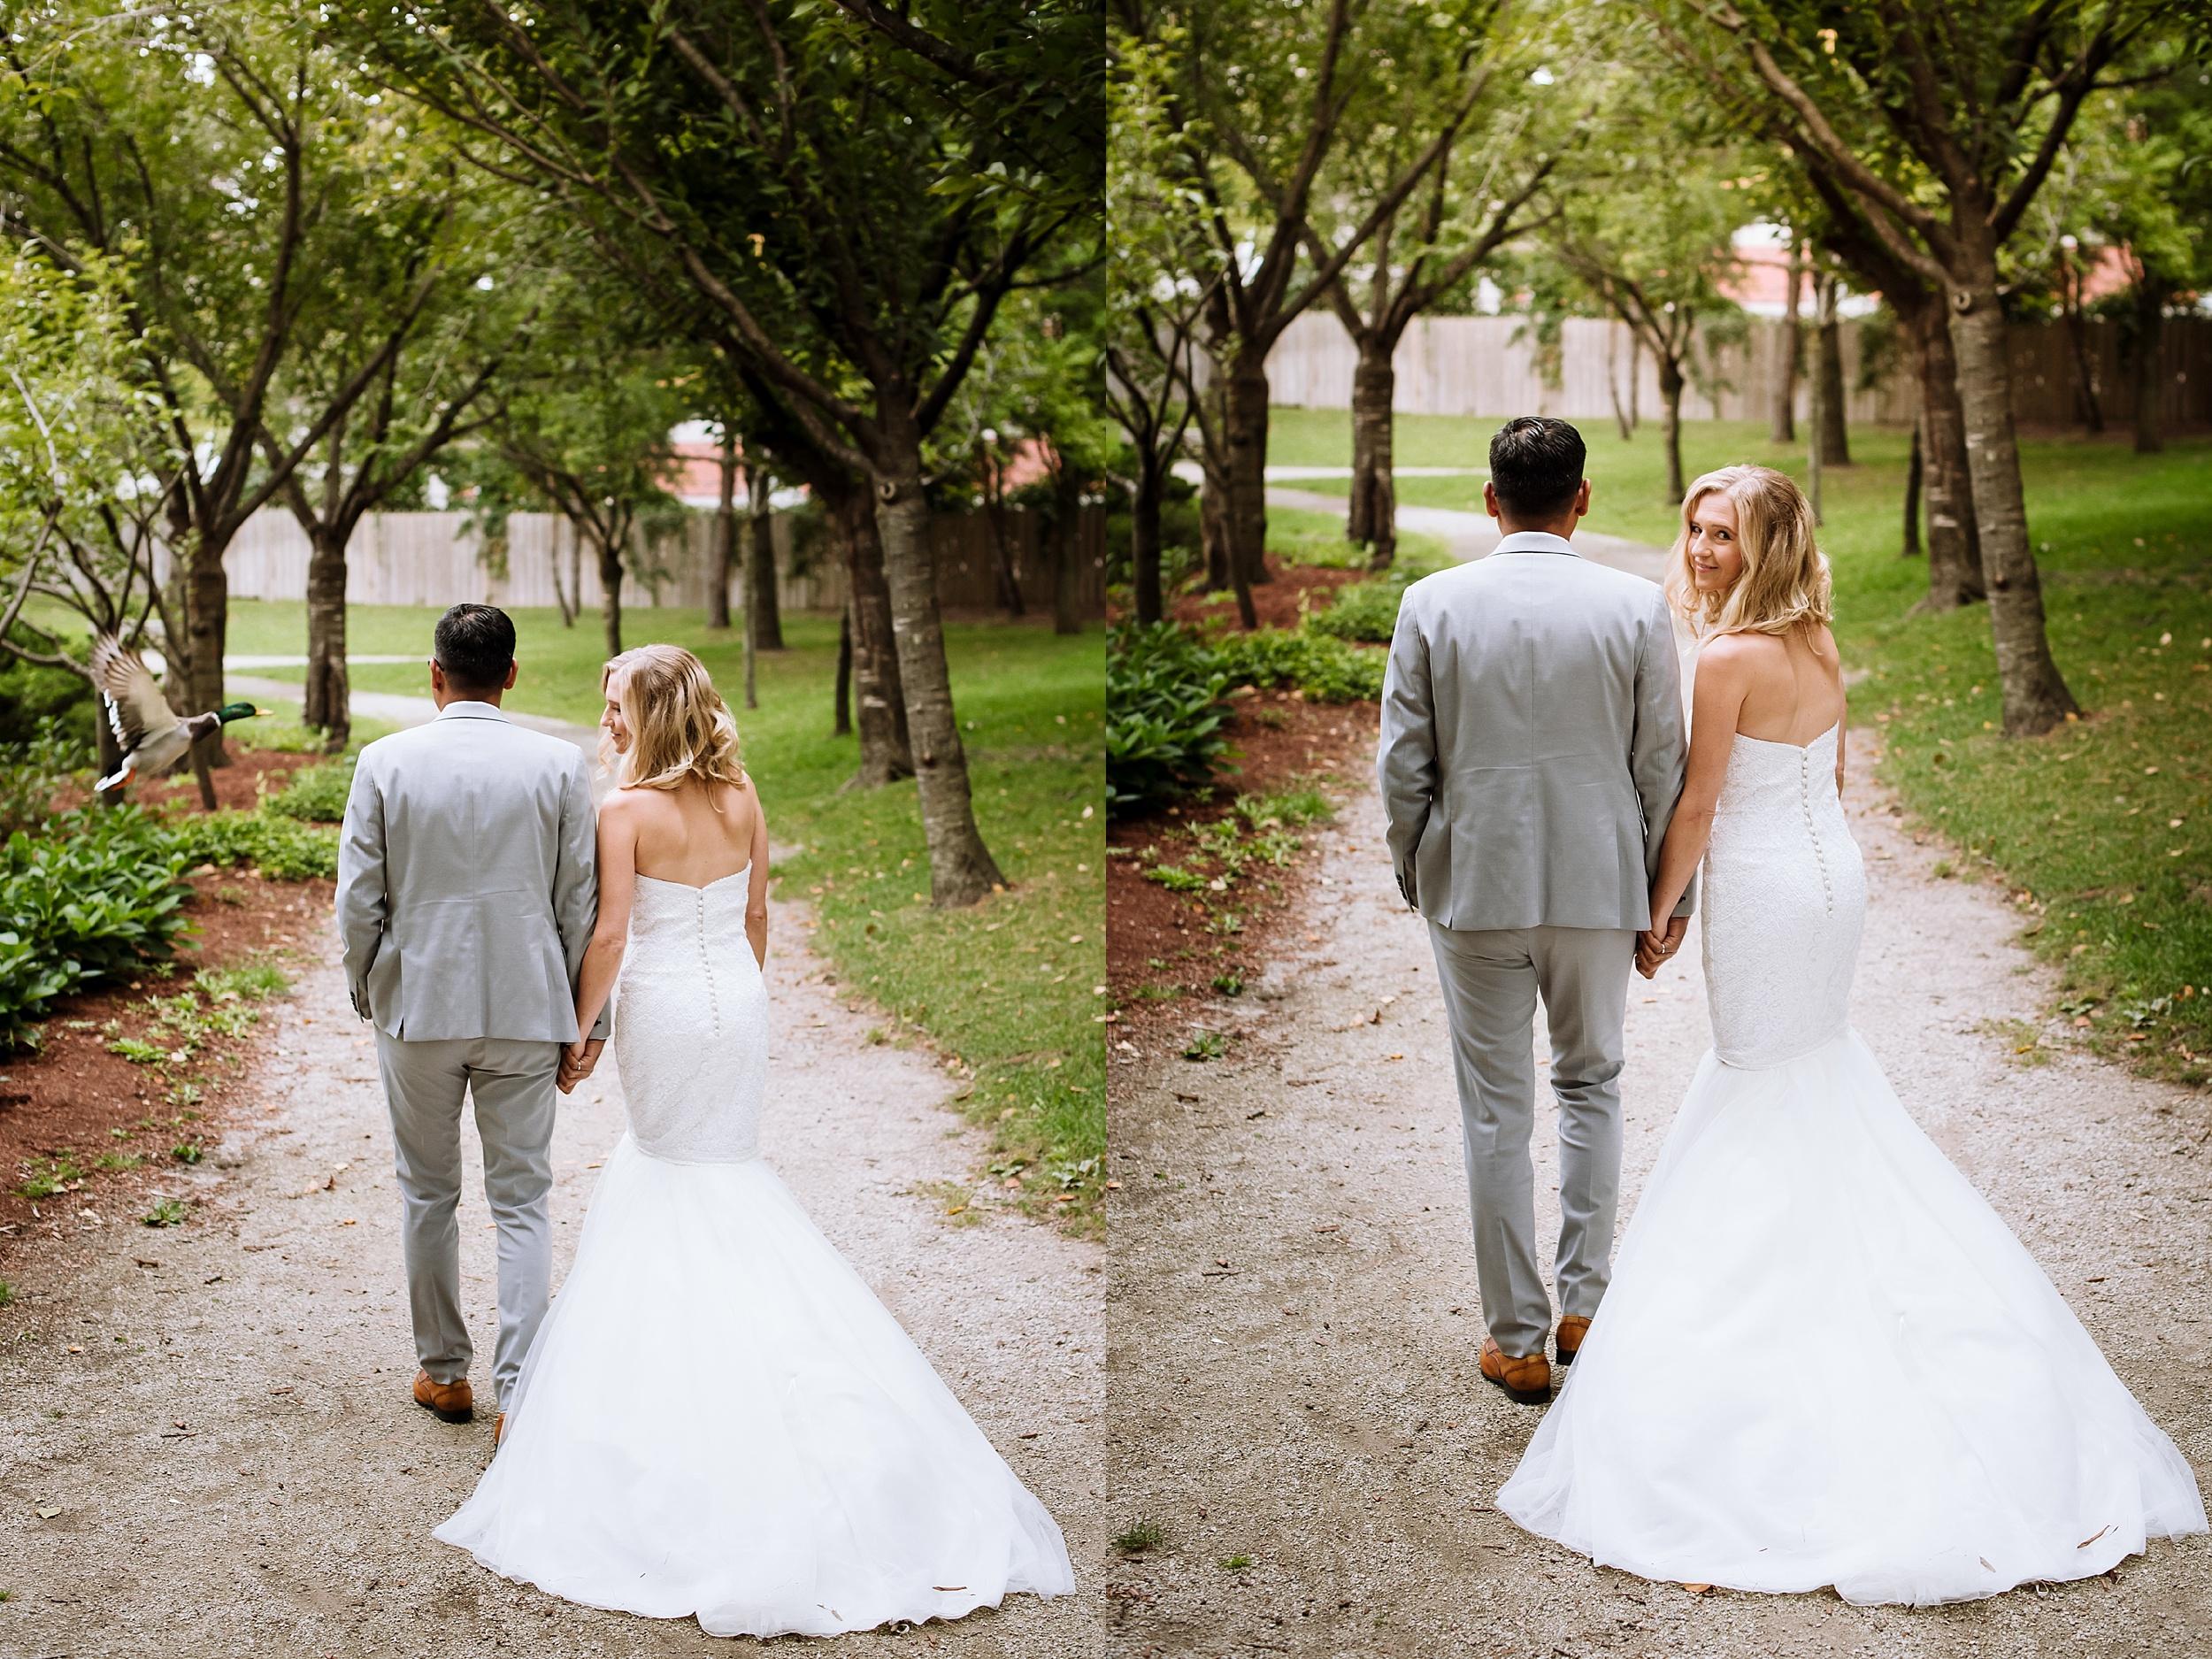 Kariya_Park_Wedding_Shoot_Toronto_Photographer_0031.jpg